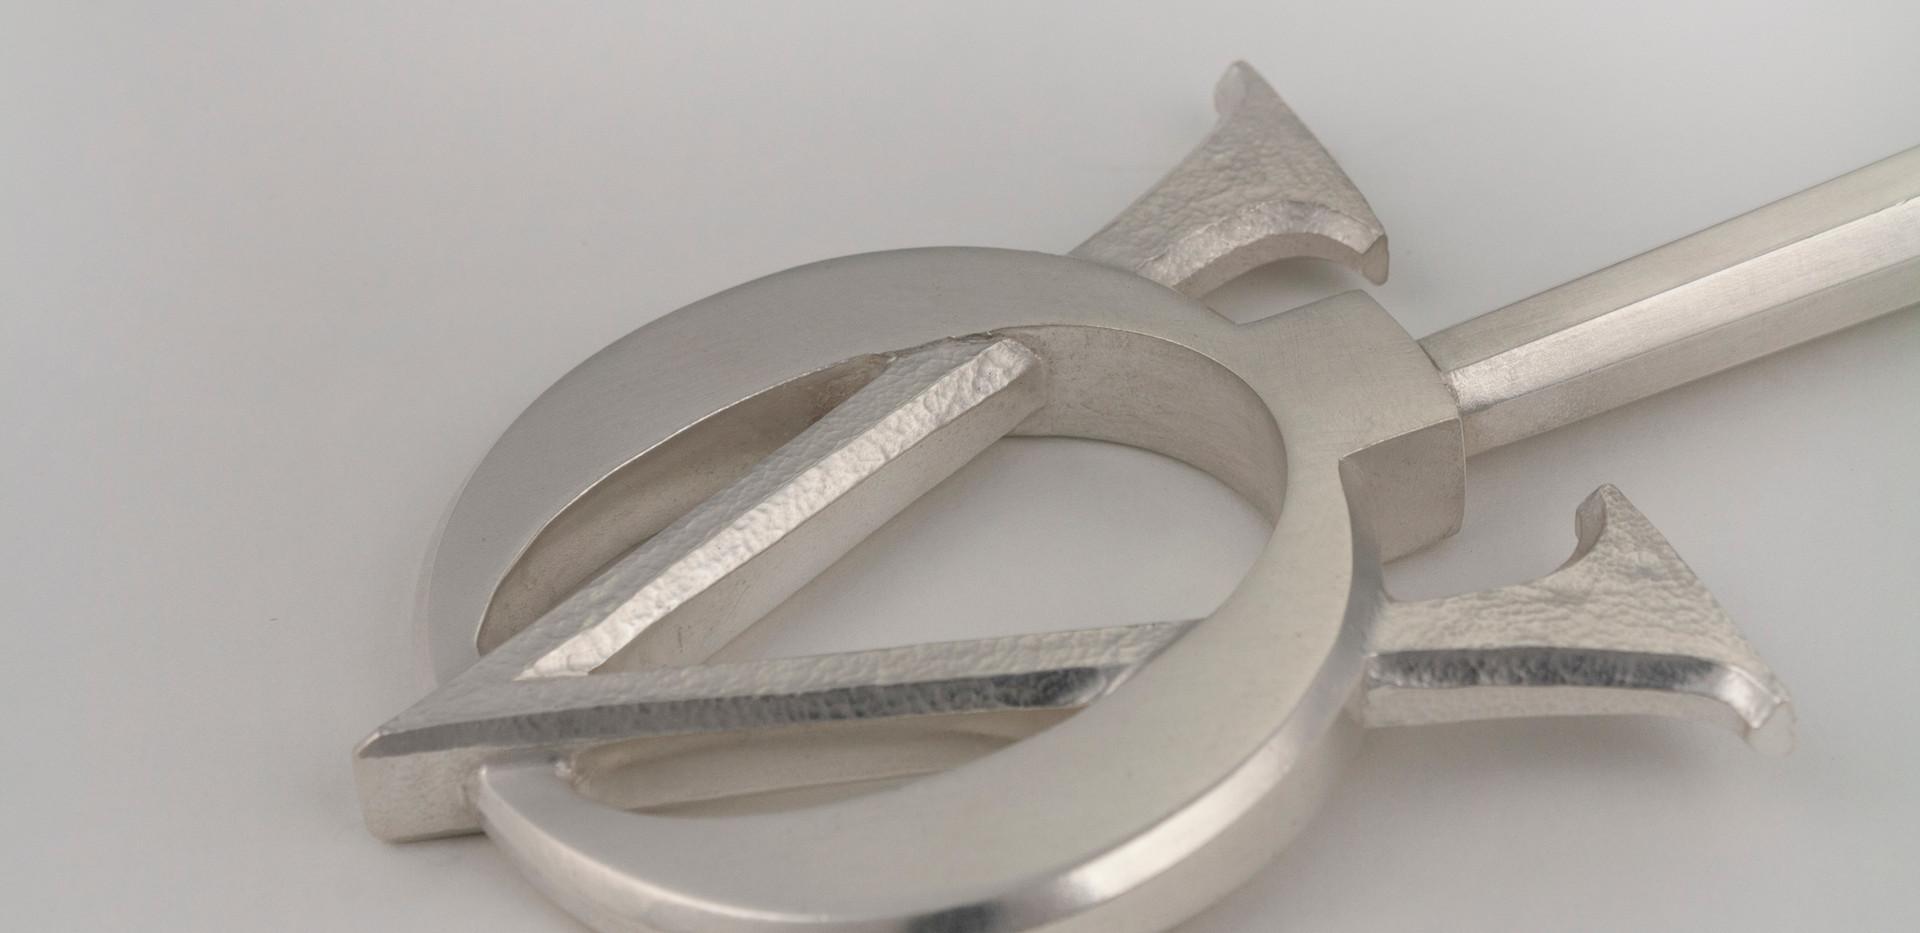 Ceremonial Key (detail)